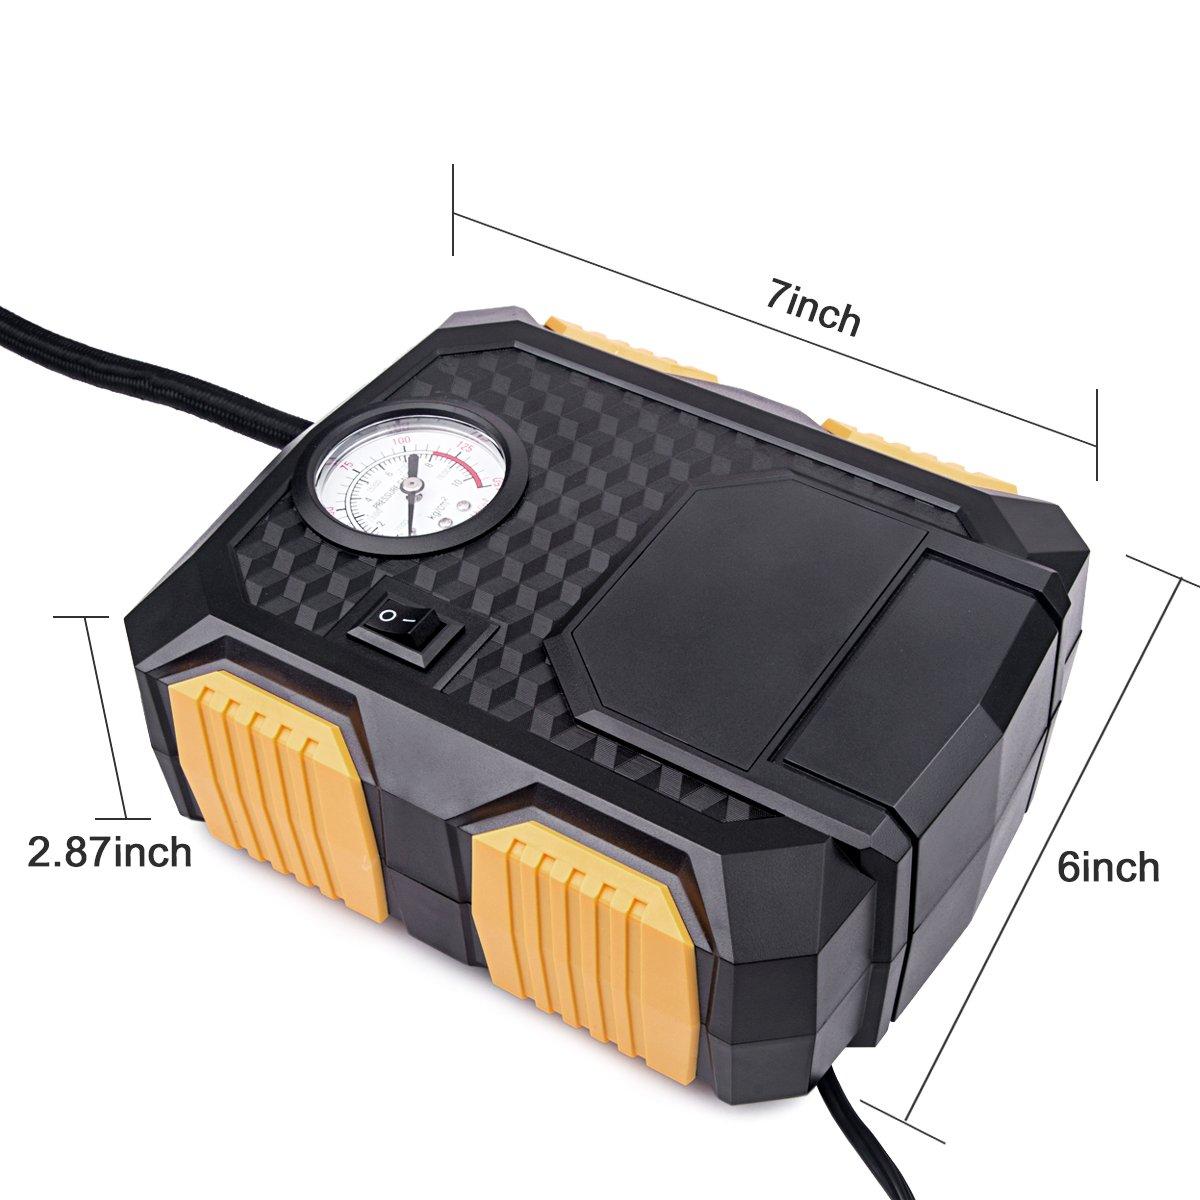 12V DC 150PSI Electric Auto Air Compressor Pump,Huicocy Portable Digital Car Tire Inflator Tire Pump with Led Light 3M Power Cord